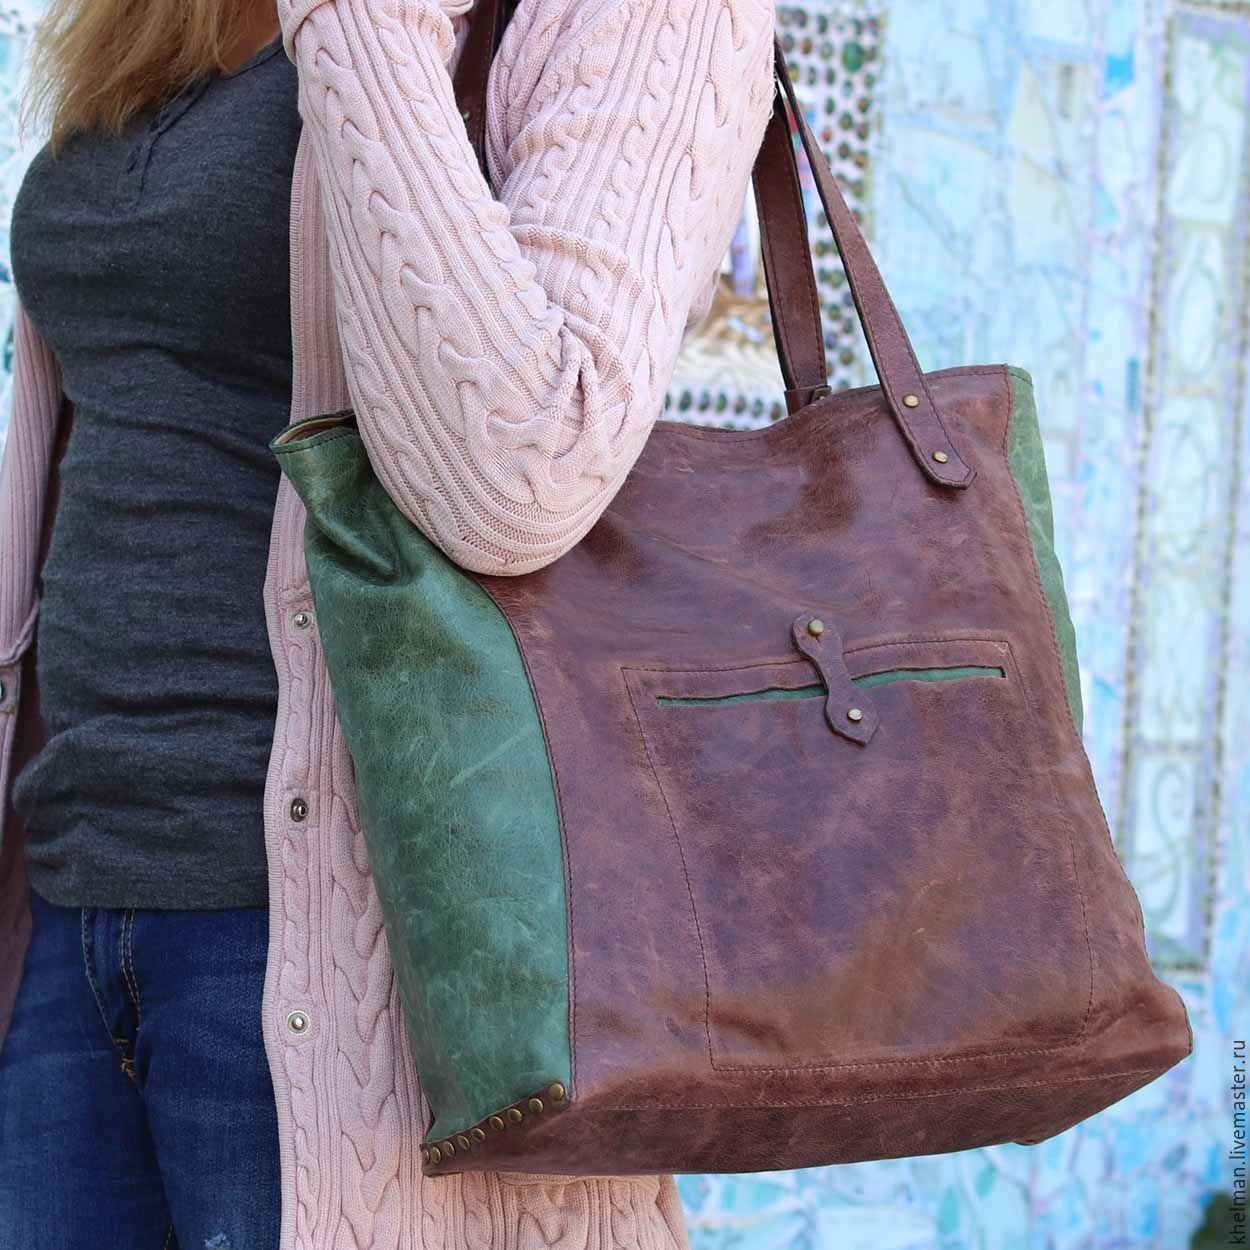 Пропорции сумки в жизни при росте 162см.